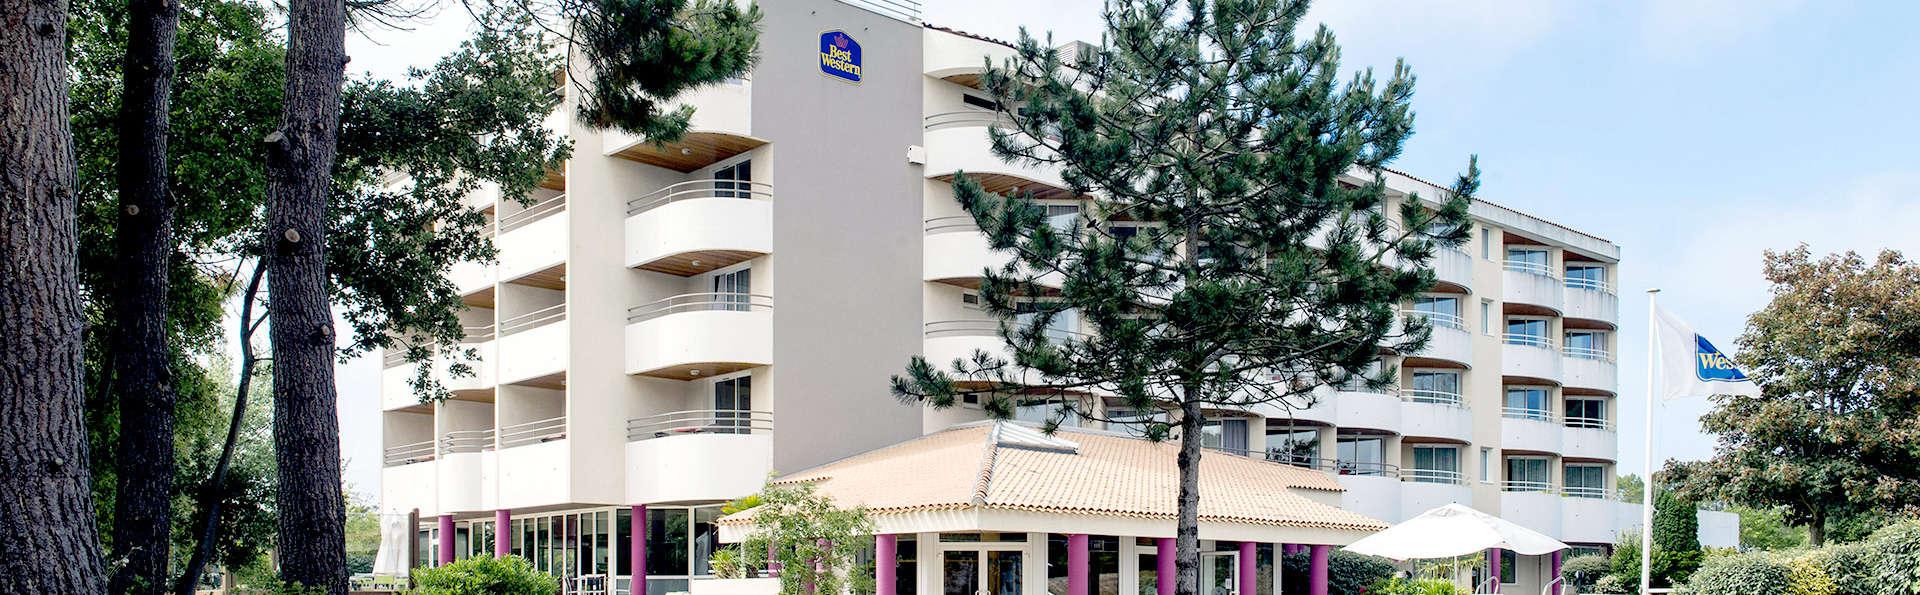 Hôtel Atlantic Thalasso Valdys - Edit_Front2.jpg